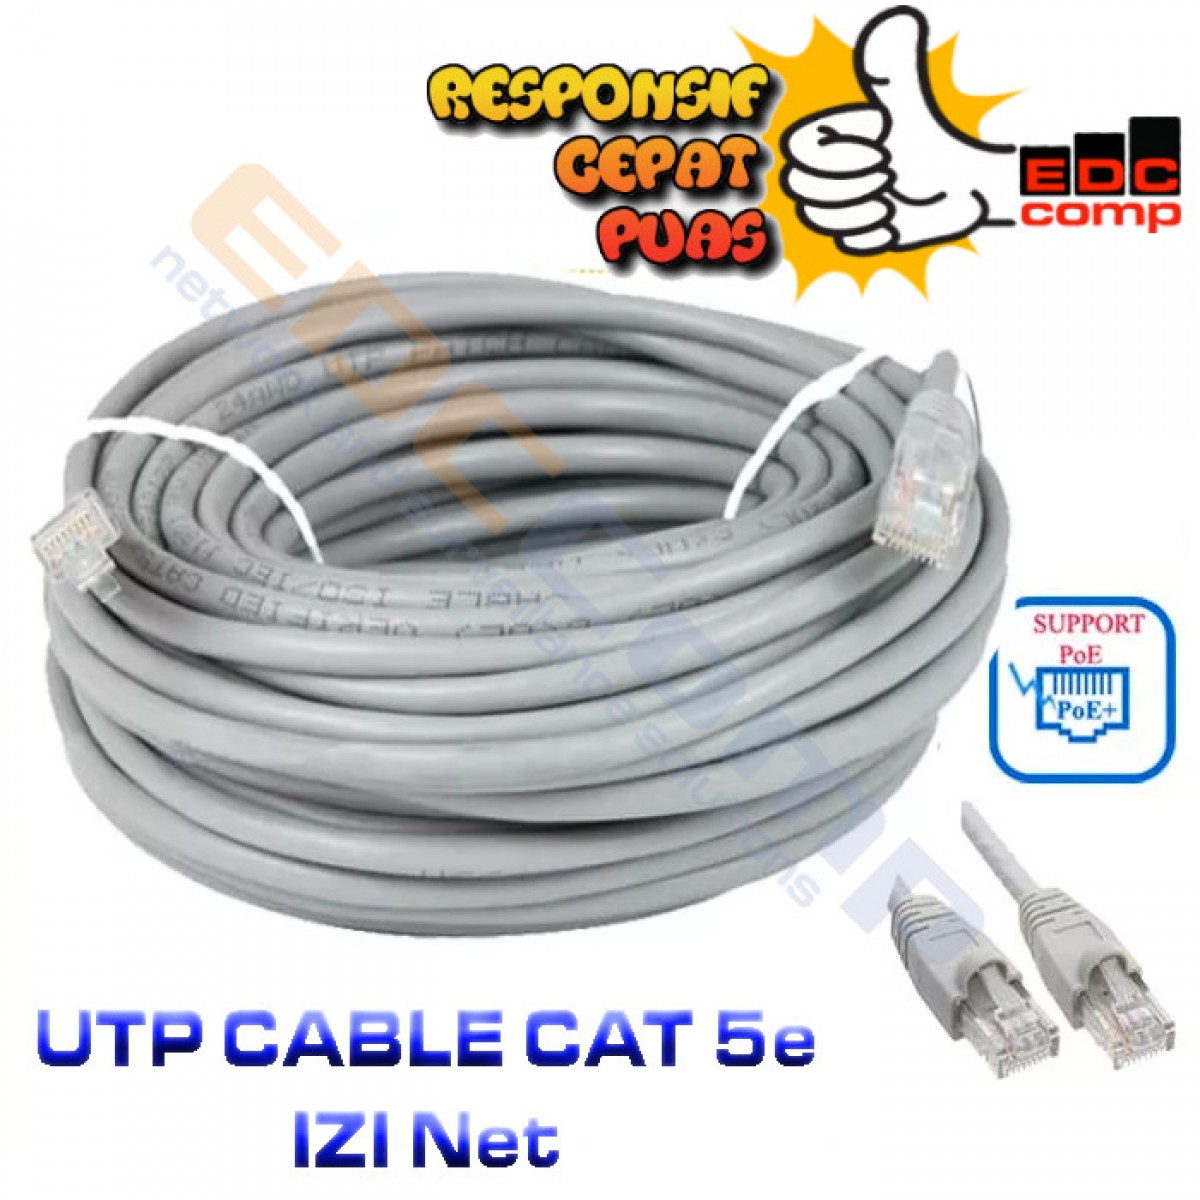 UTP Cable IZINET Cat5E 75 Meter - EdcComp